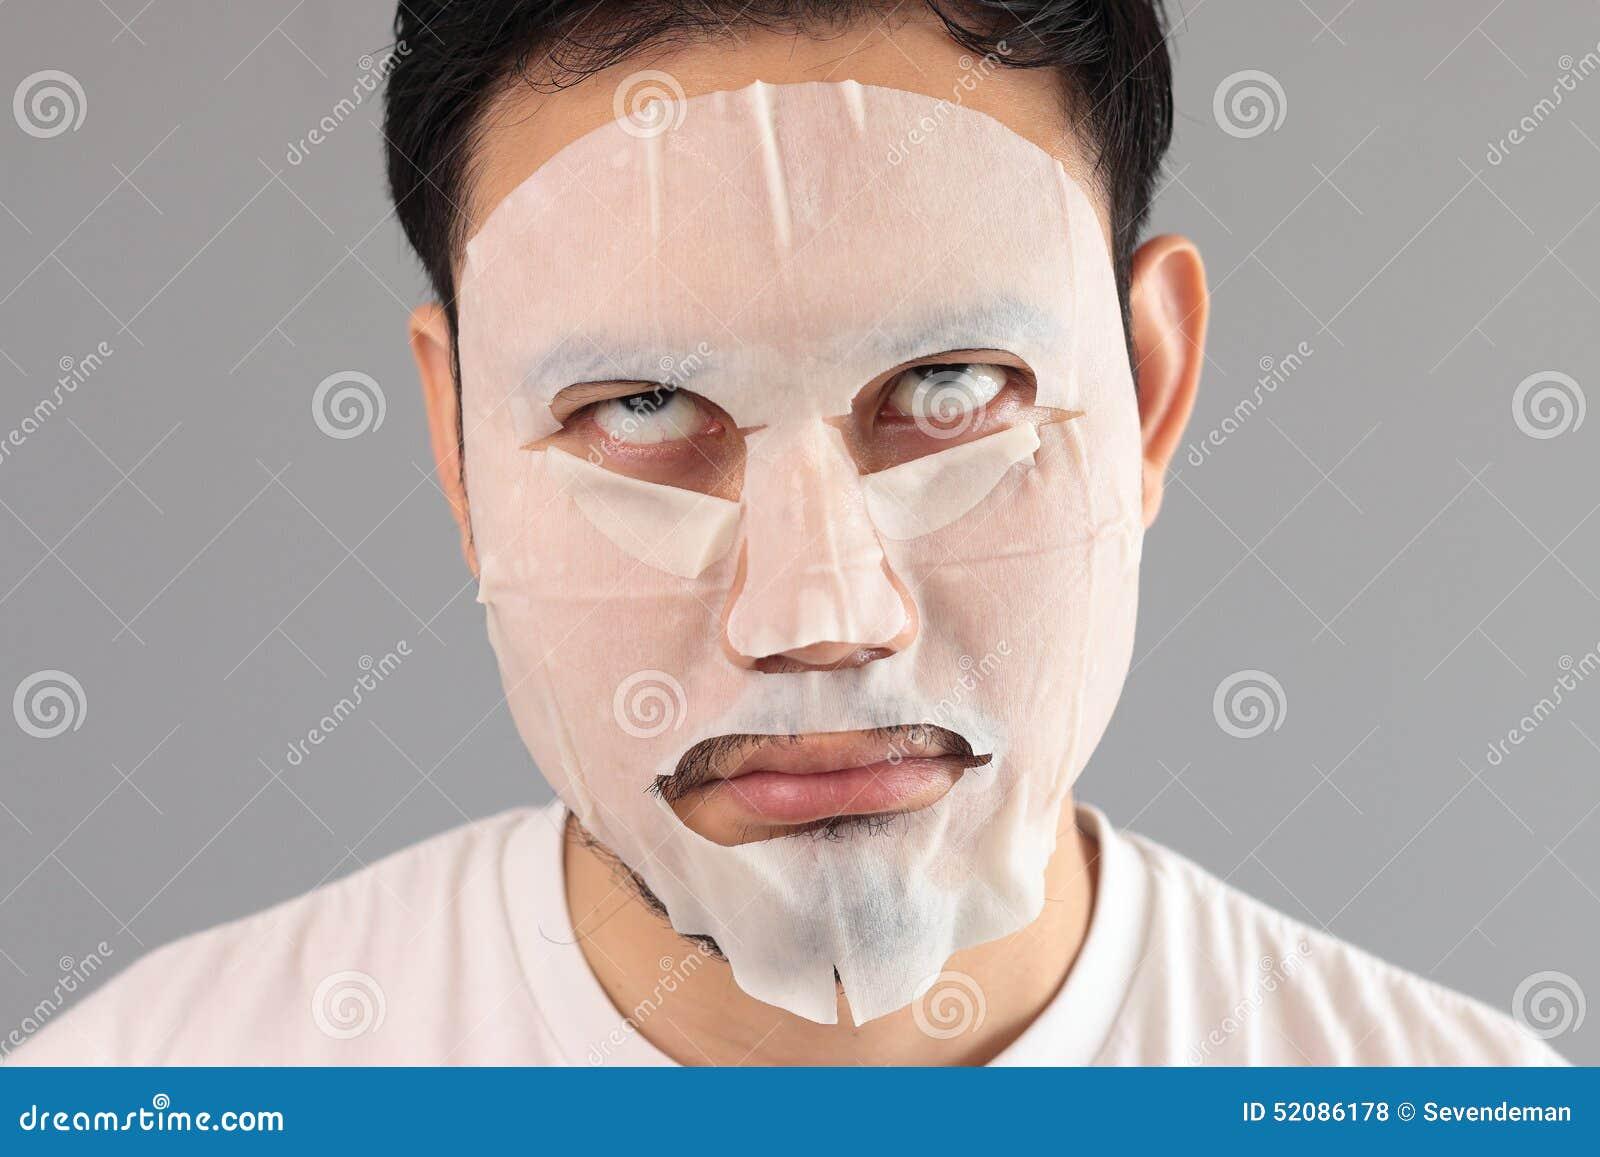 Man put on treatment mask.